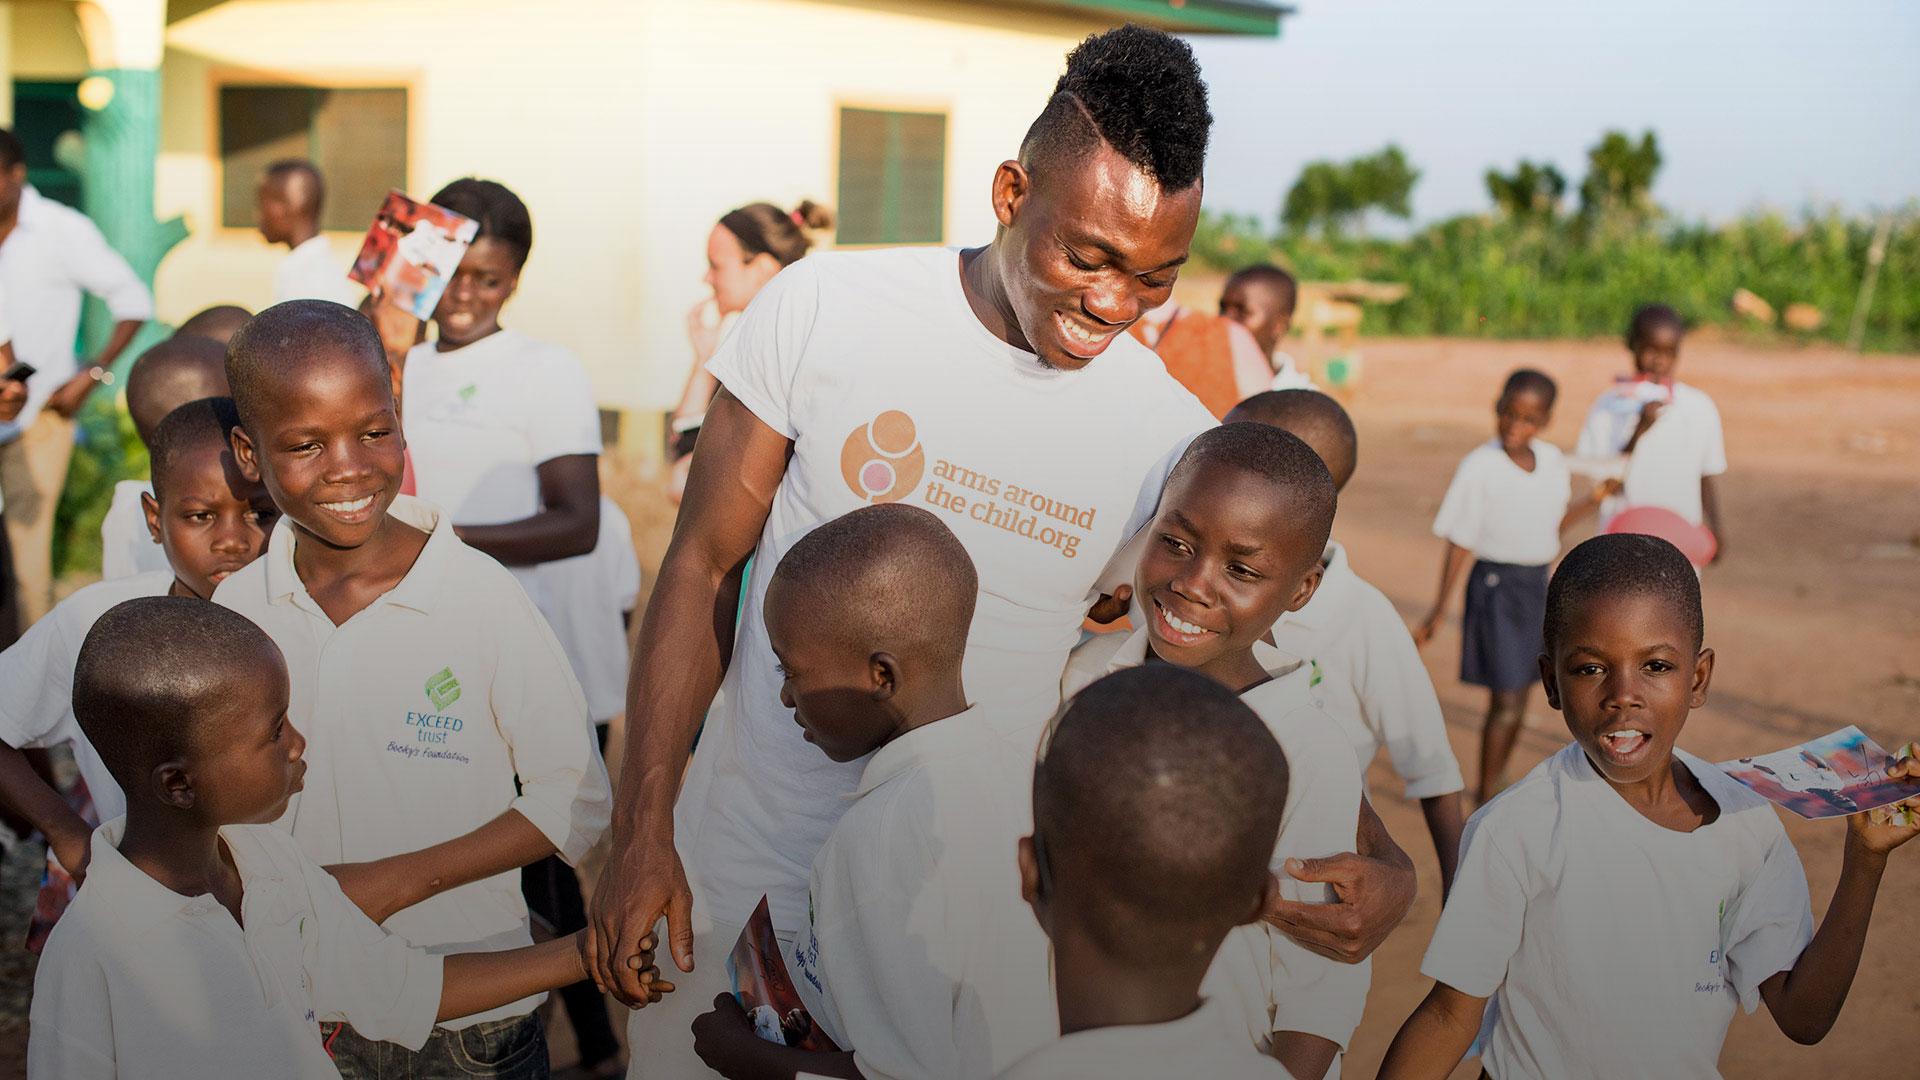 AATC launch in Ghana with Christian Atsu as ambassador